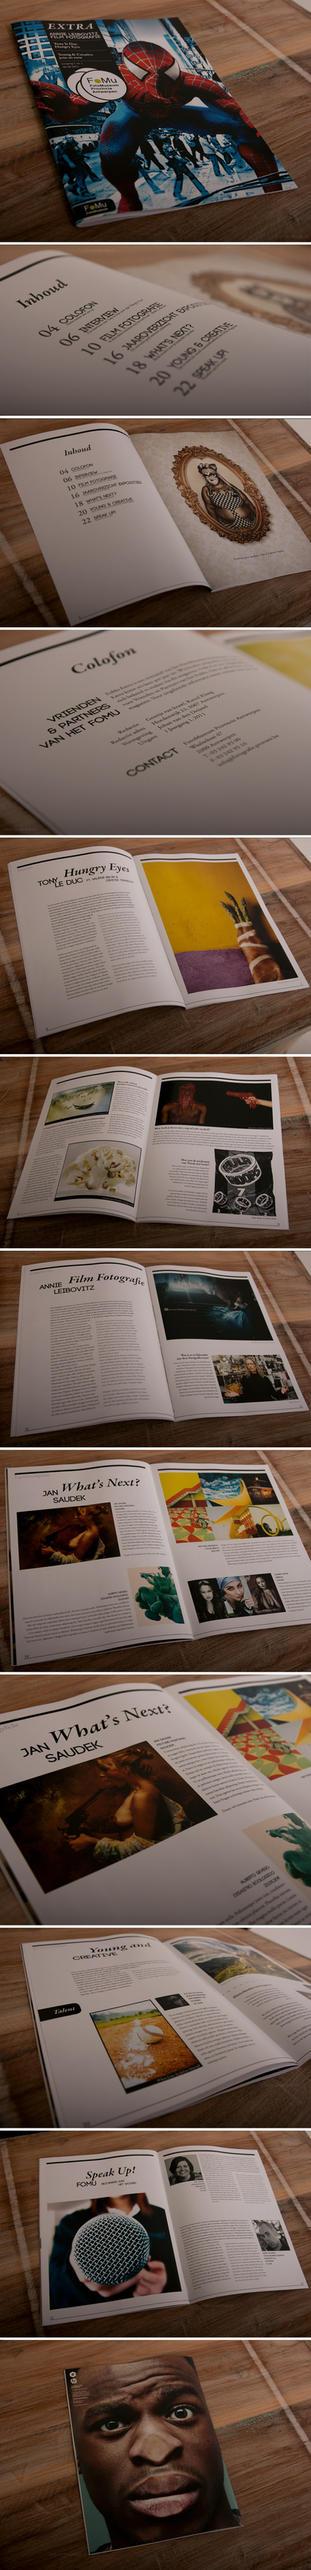 Fomu Magazine concept by buttervlieg